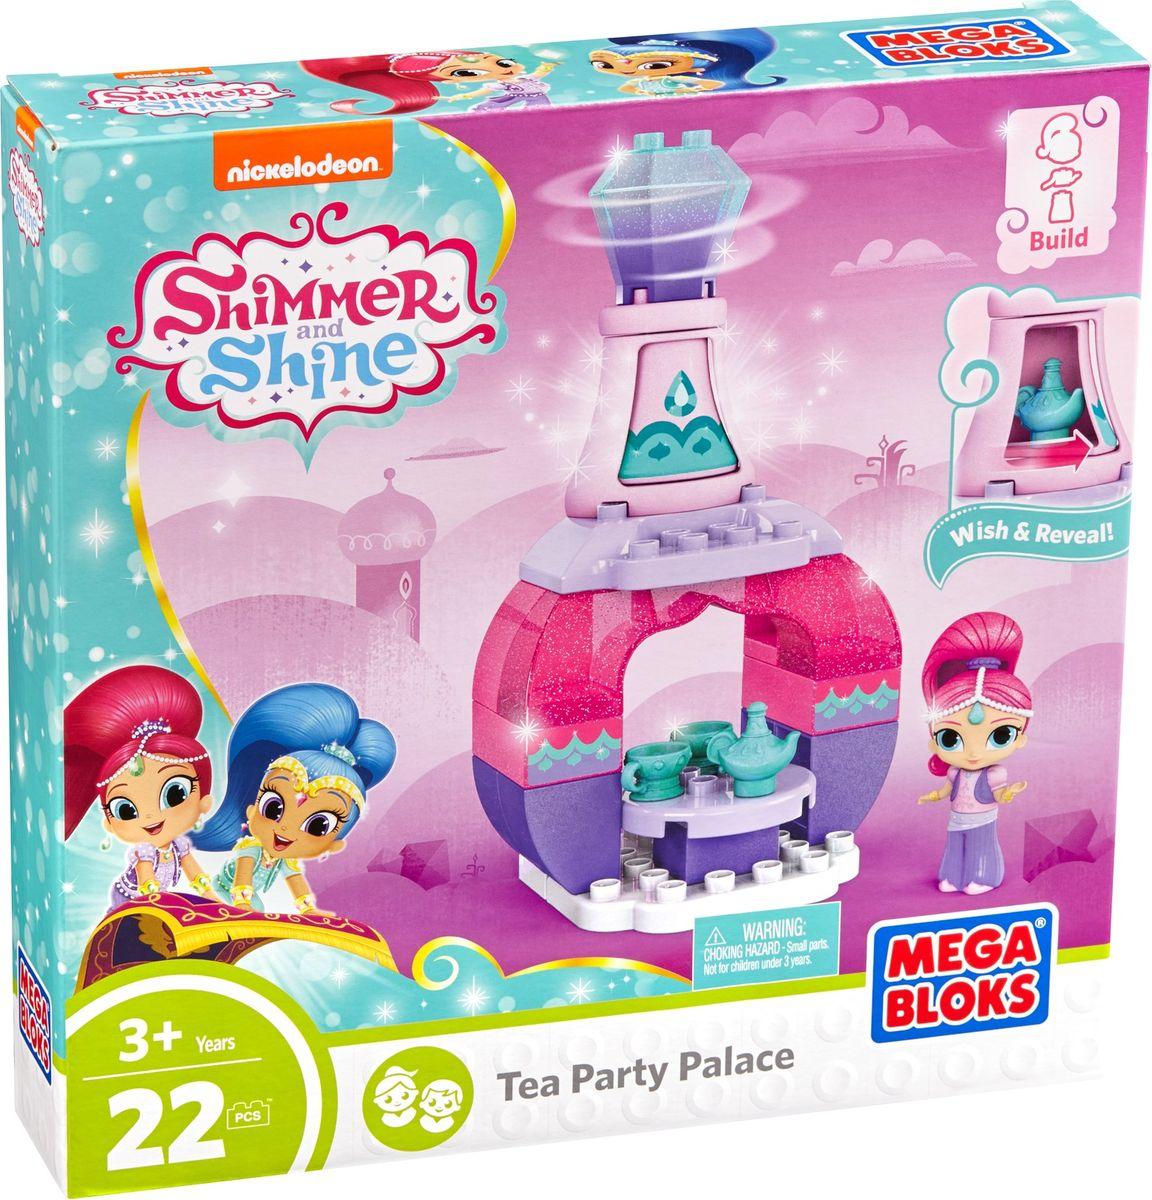 Mega Bloks Shimmer & Shine Конструктор Дворцы маленьких джинников Tea Party Palace shimmer & shine набор фигурок тала и нала